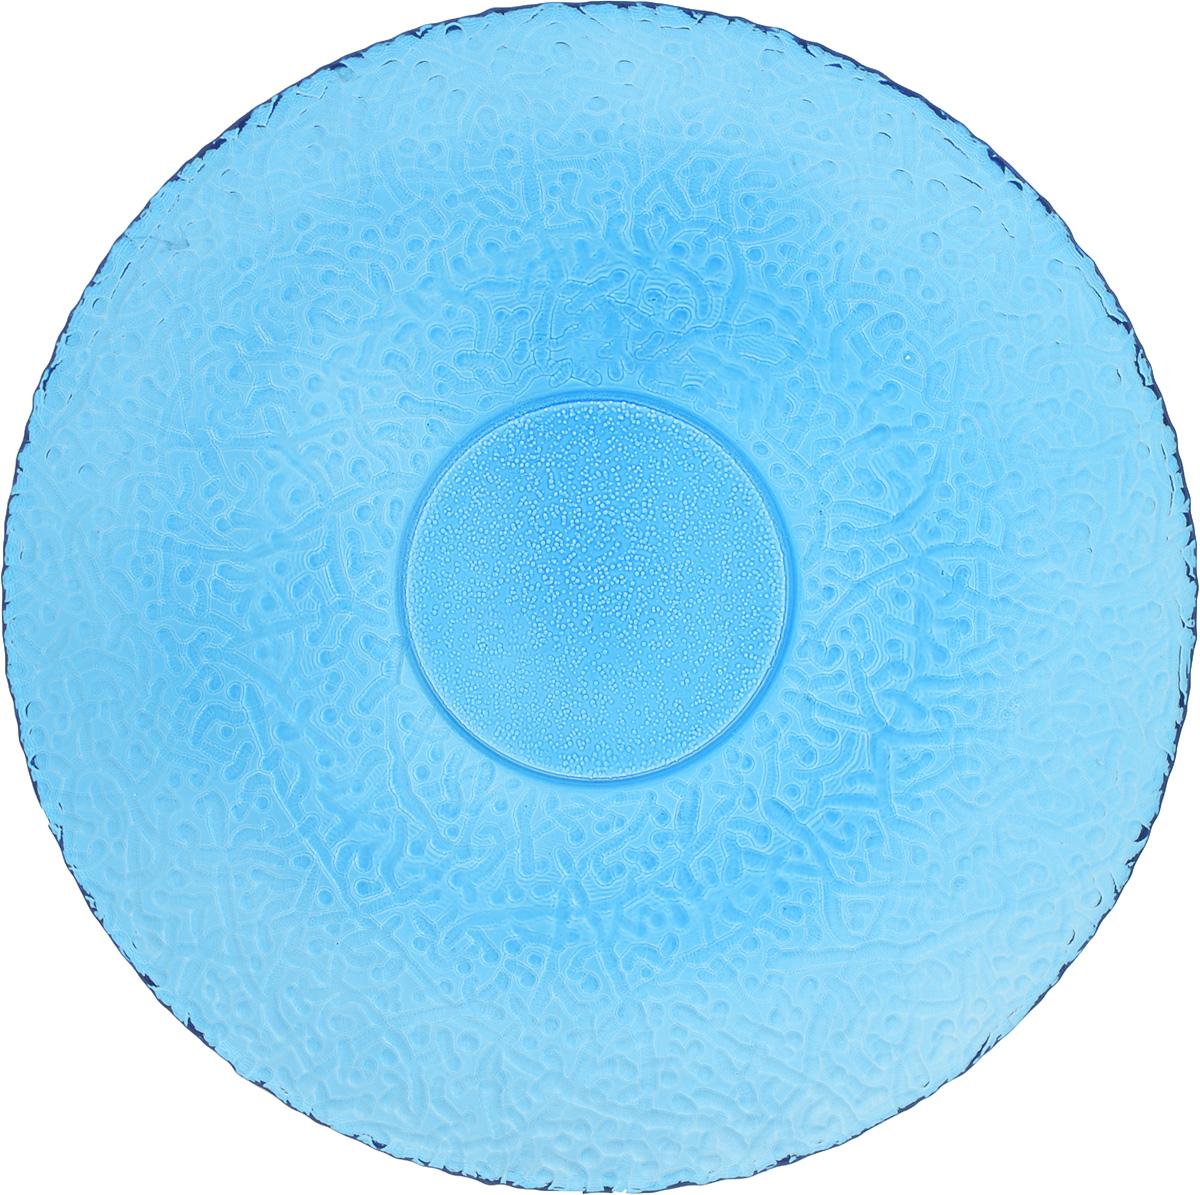 Тарелка NiNaGlass Ажур, цвет: синий, диаметр 26 см